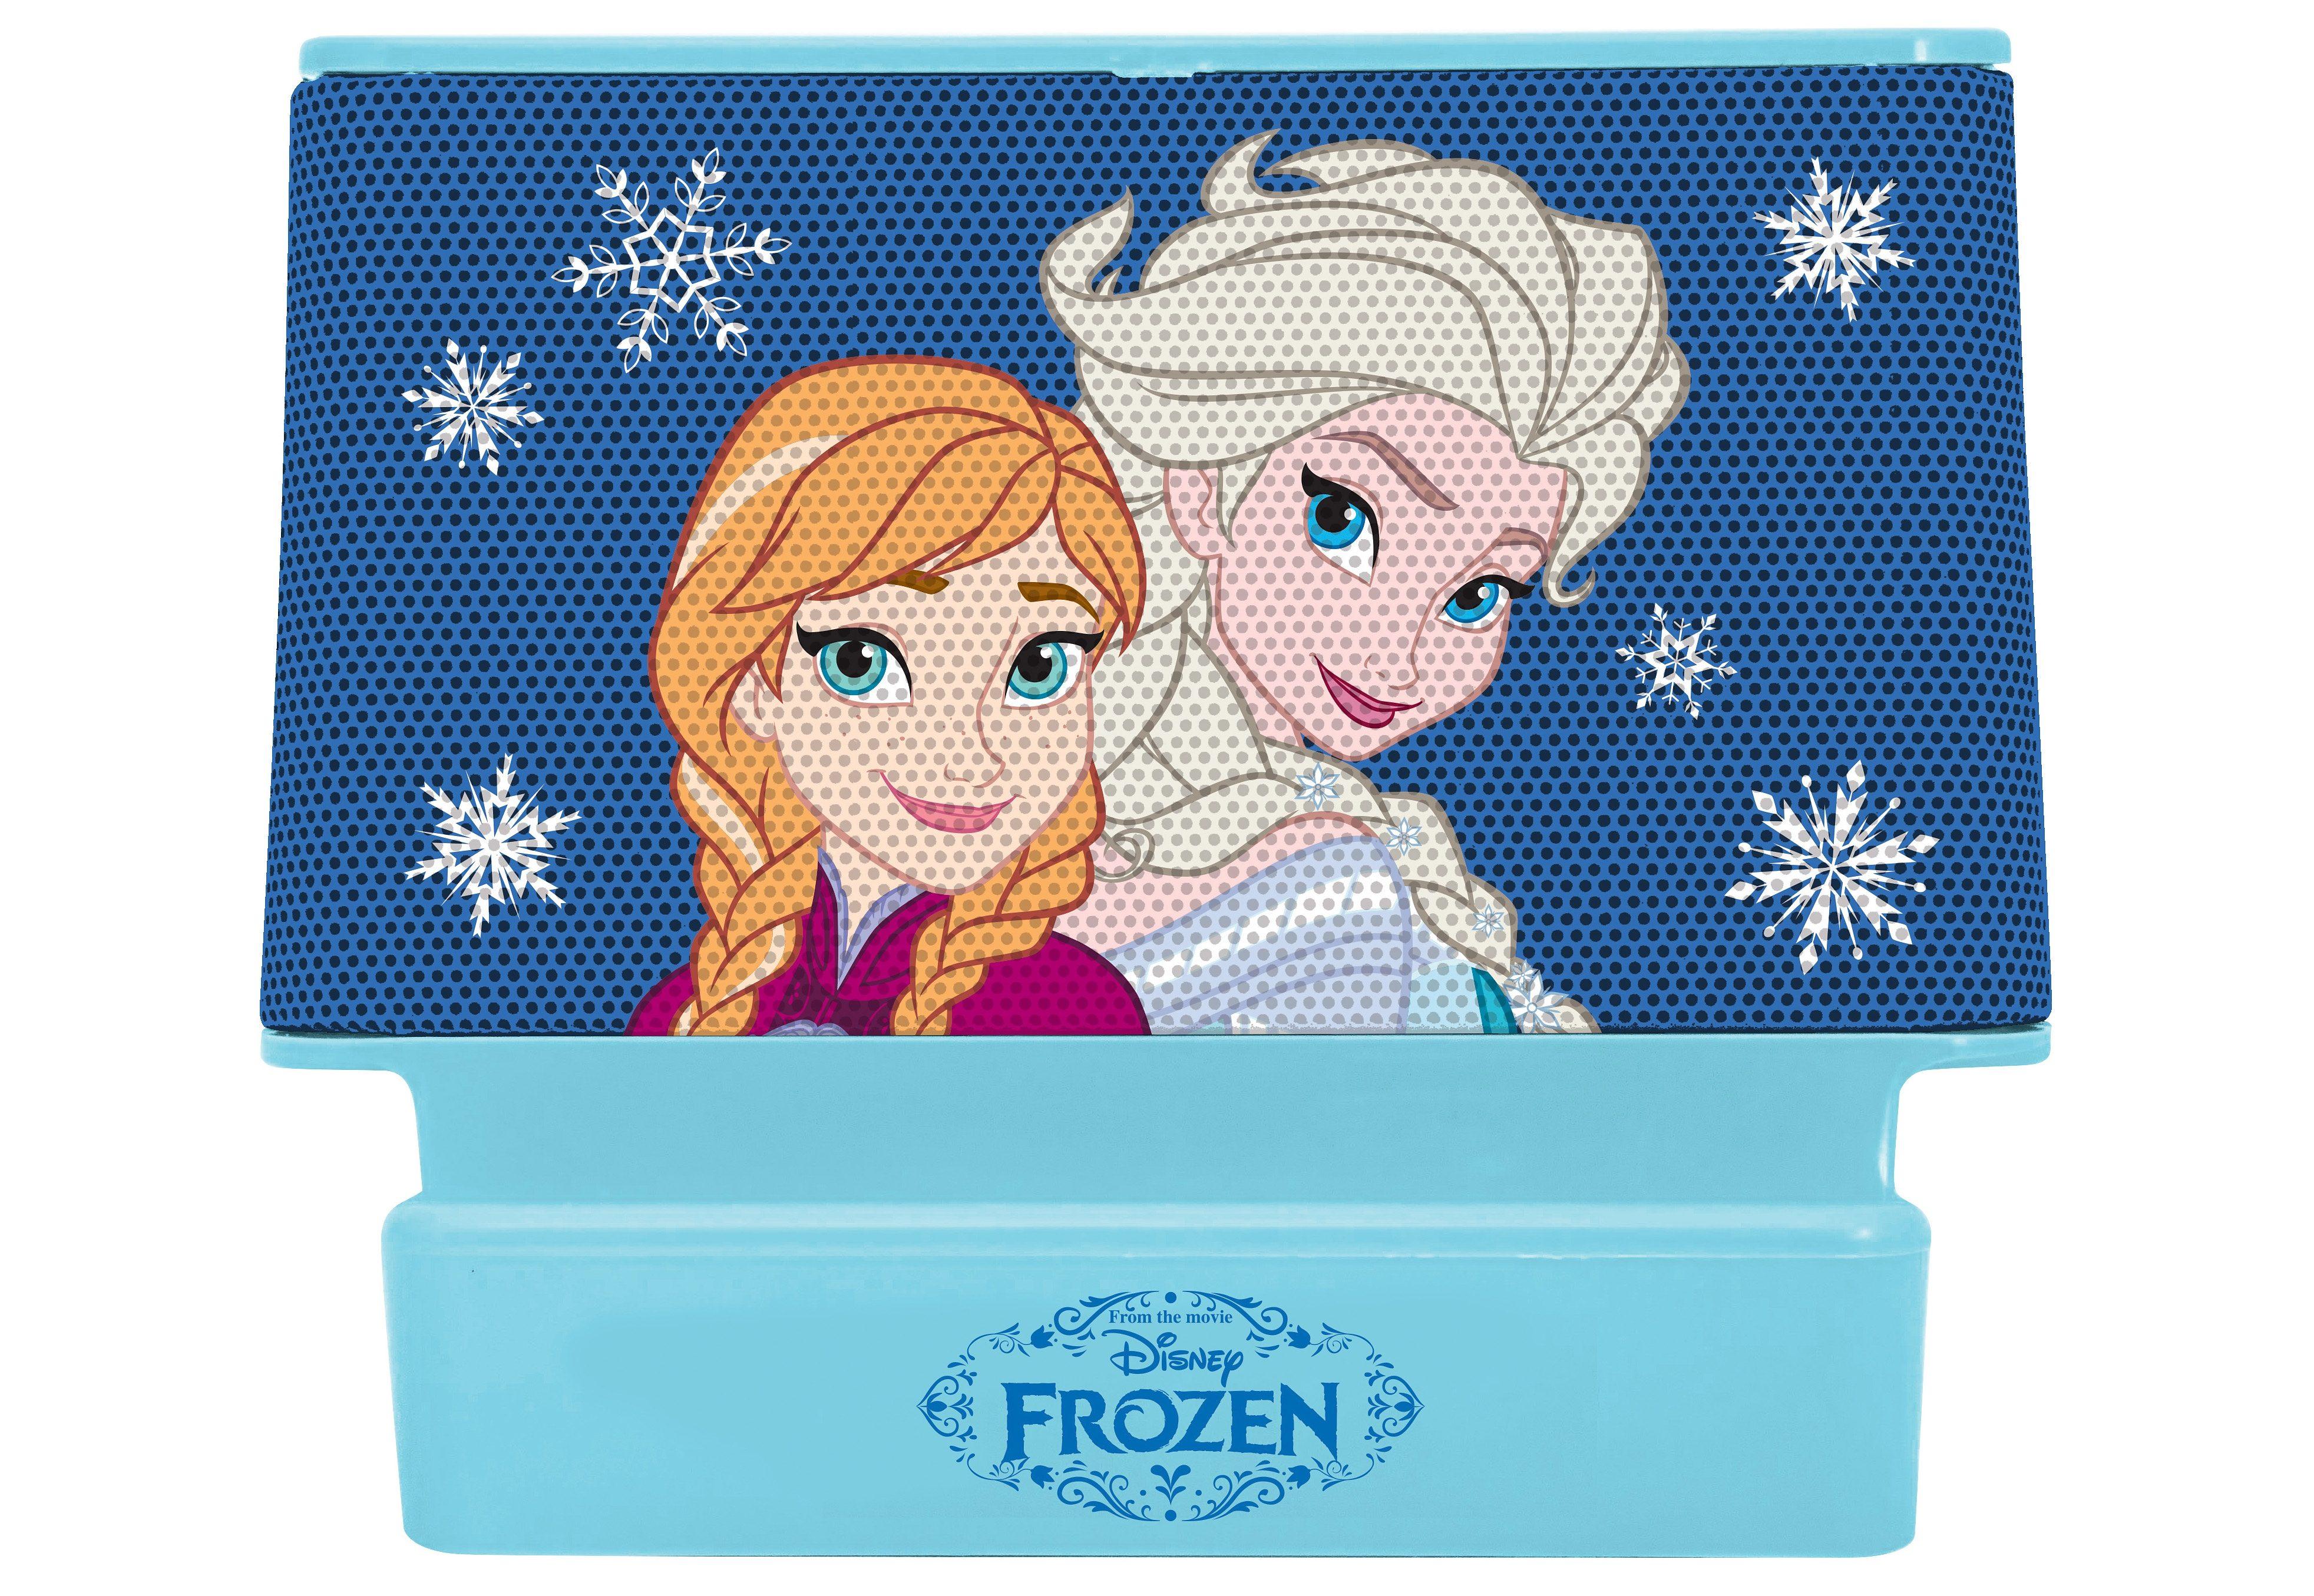 Lexibook Lautsprecher, »2x2 Watt Lautsprecher Disney Frozen«